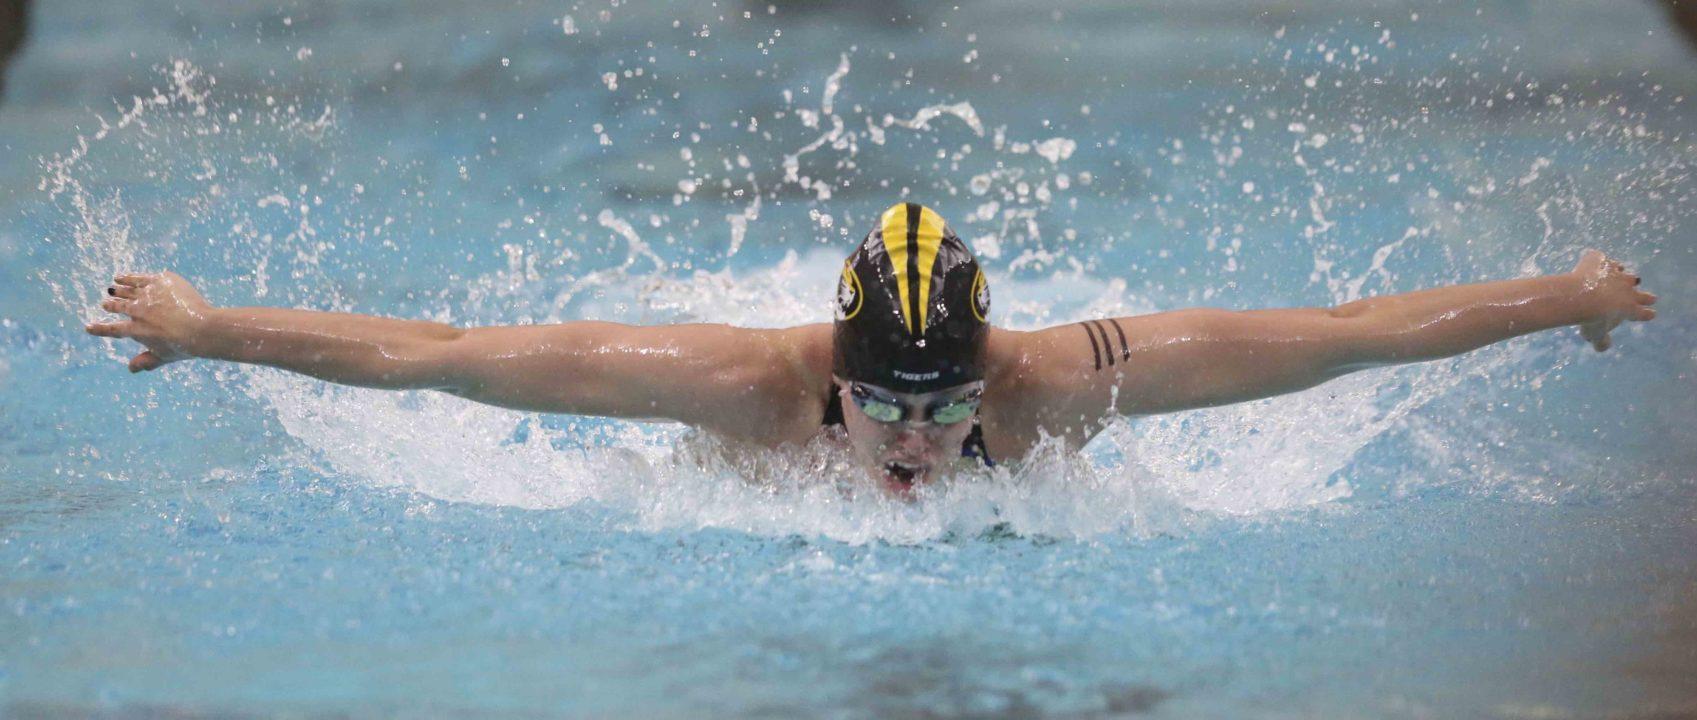 2020 Mizzou Swim Camps – Sign Up Today